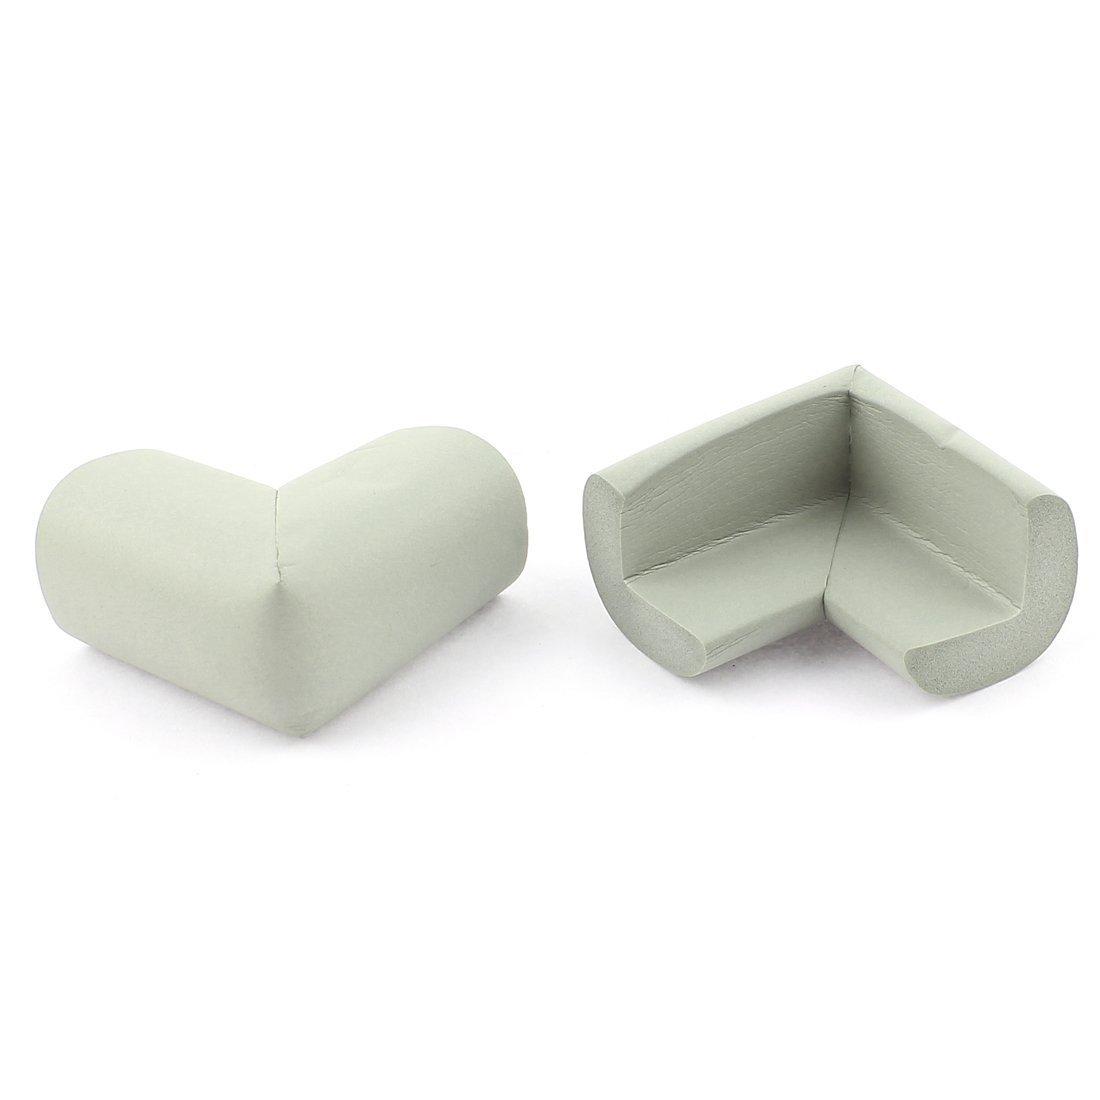 sourcingmap Table Desk Shelves Edge Corner Cushion Safety Protector 2Pcs Blue a15091400ux0360